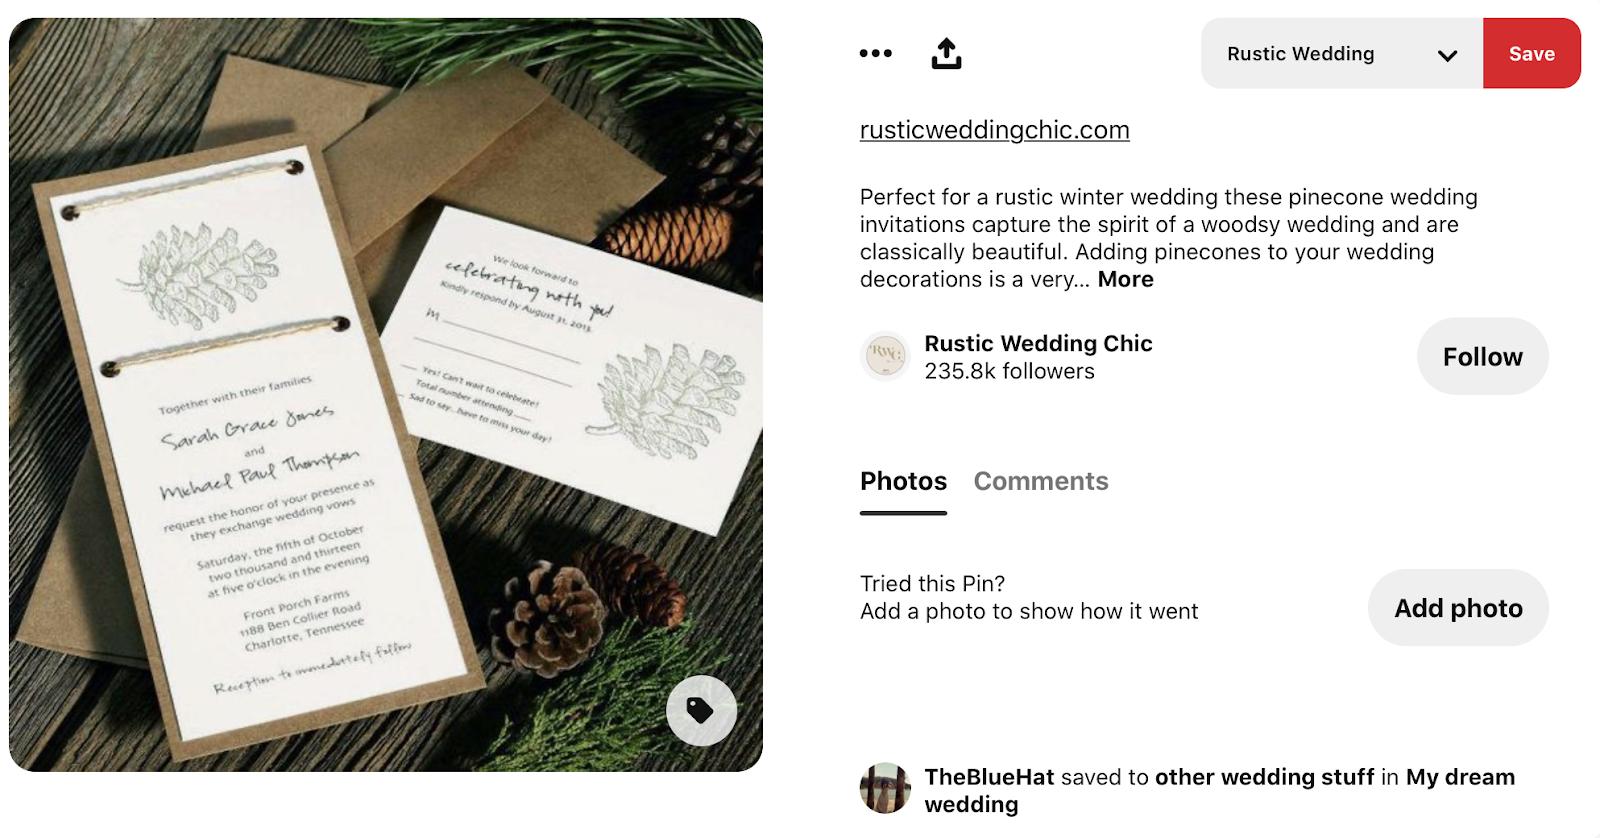 rustic wedding invitation sprayed with pine mist